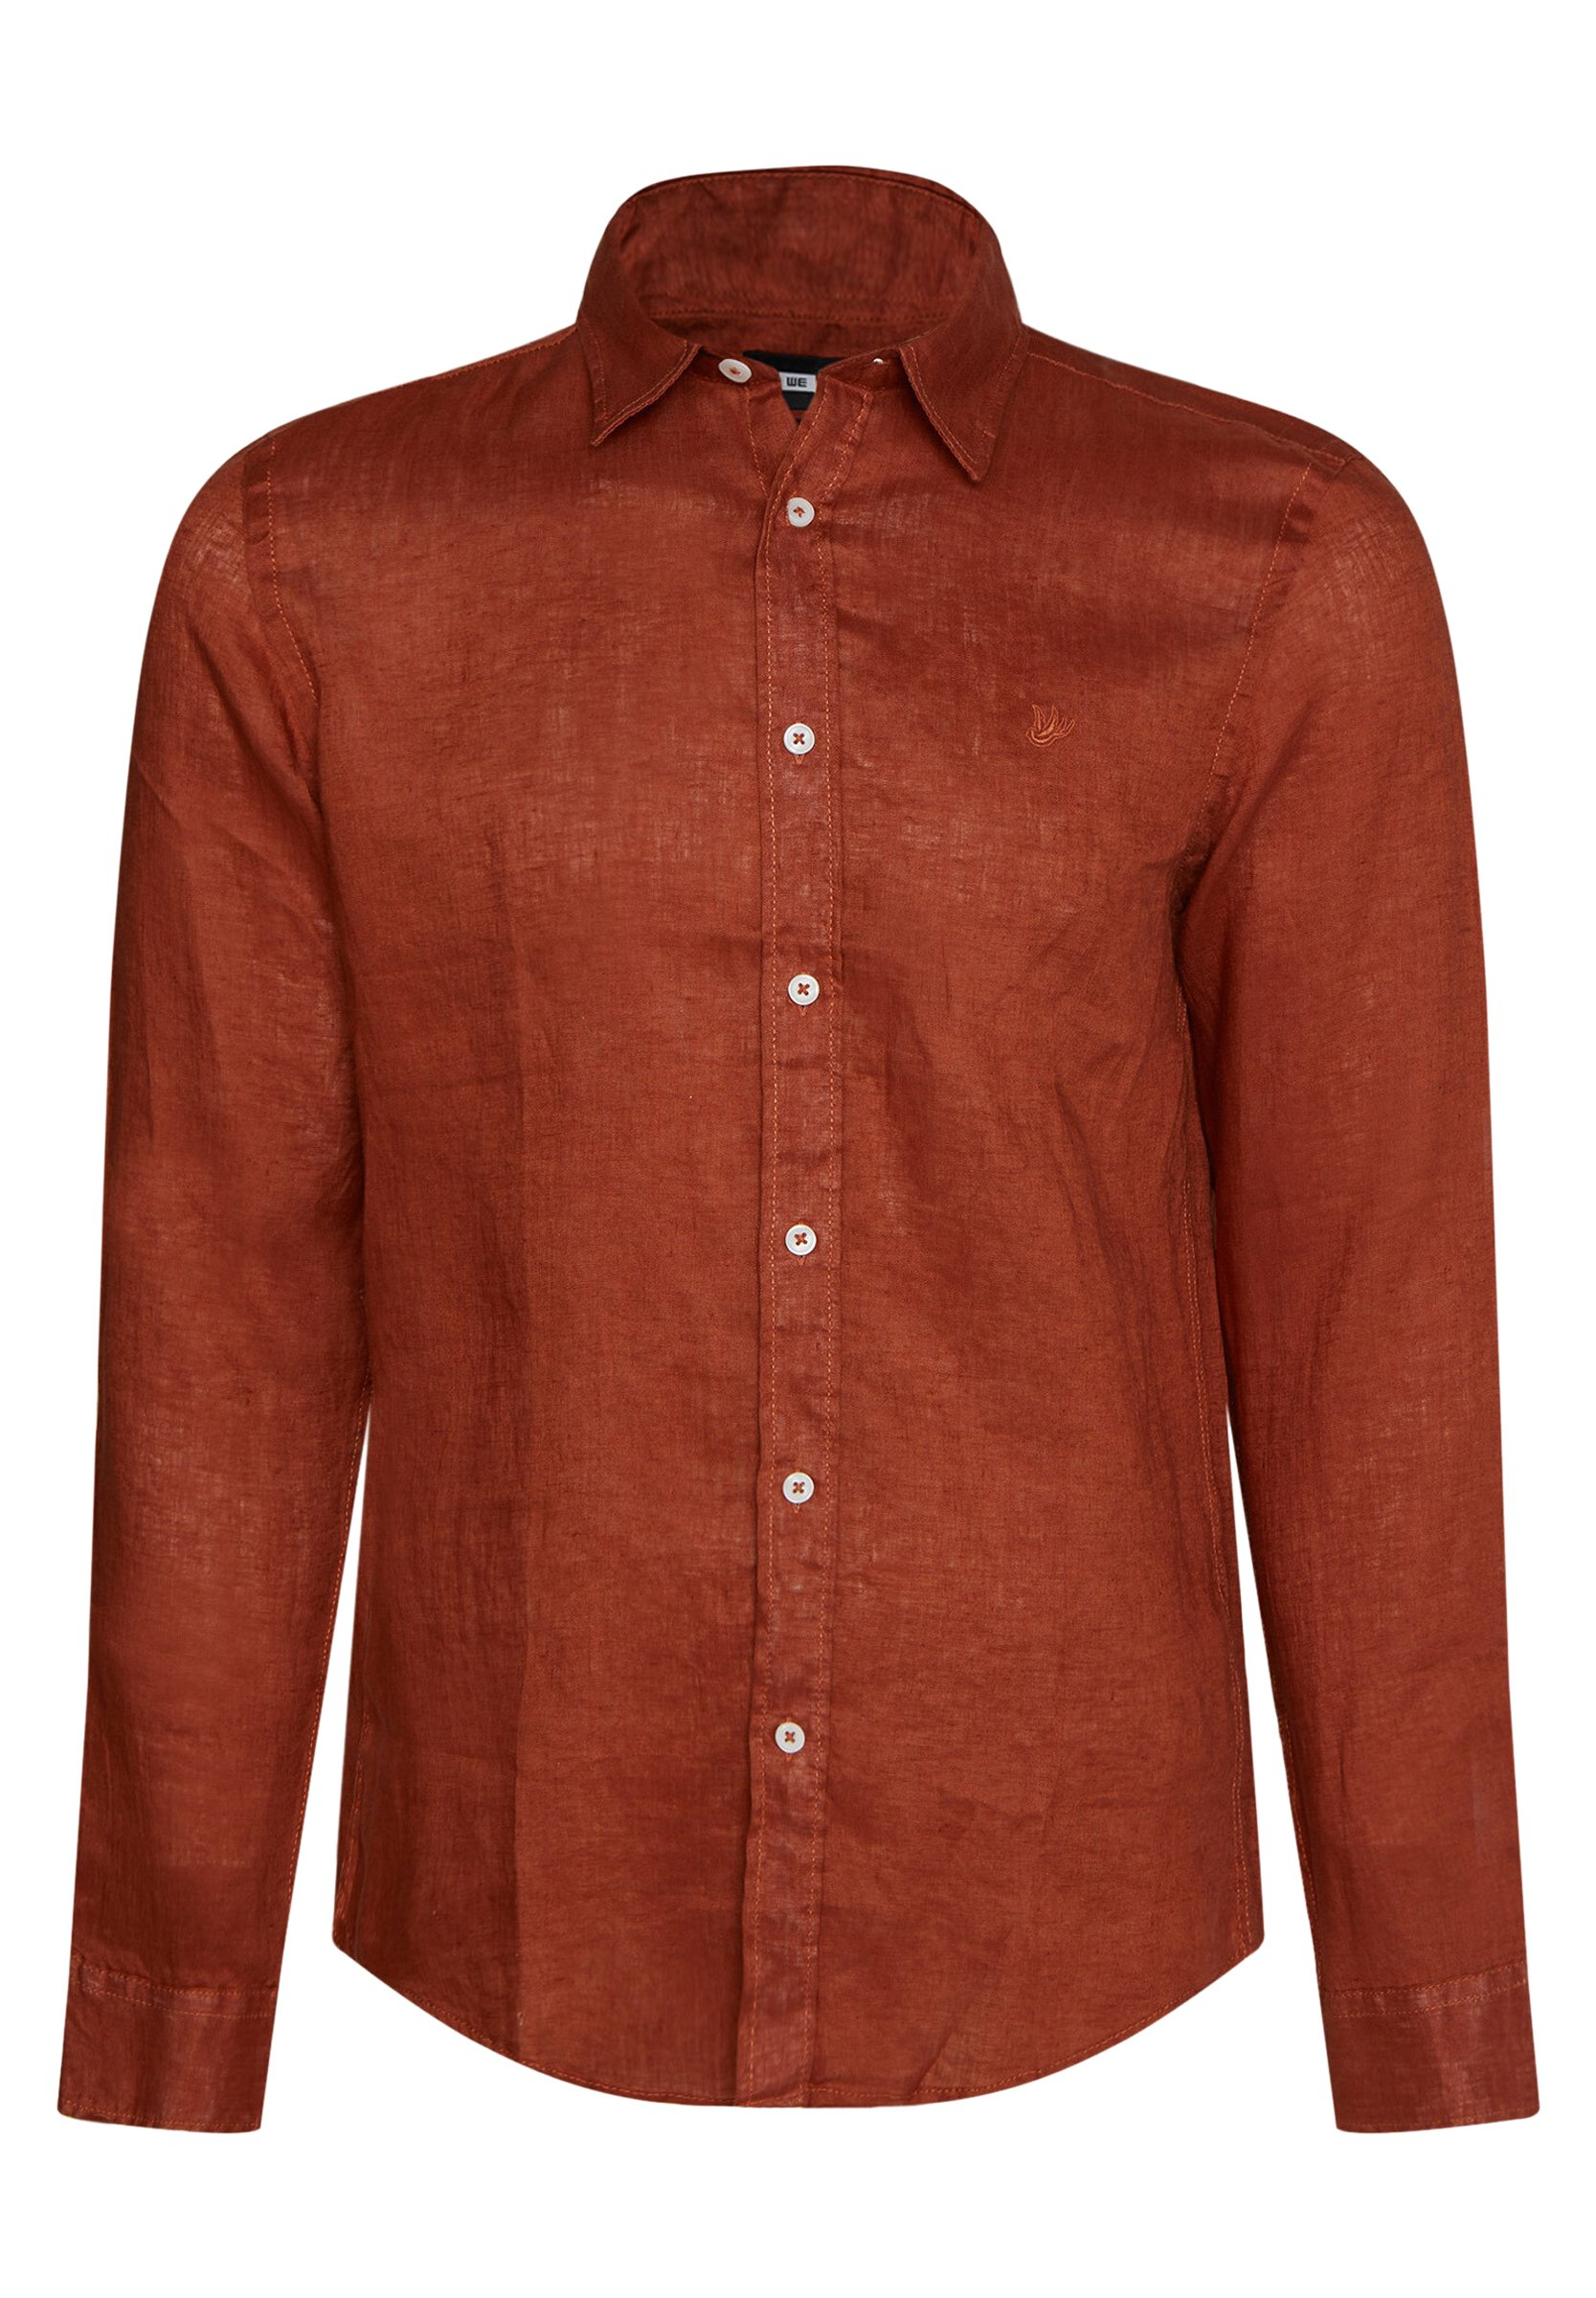 We Fashion Slim-fit - Hemd Orange SlxPLhLJ 03